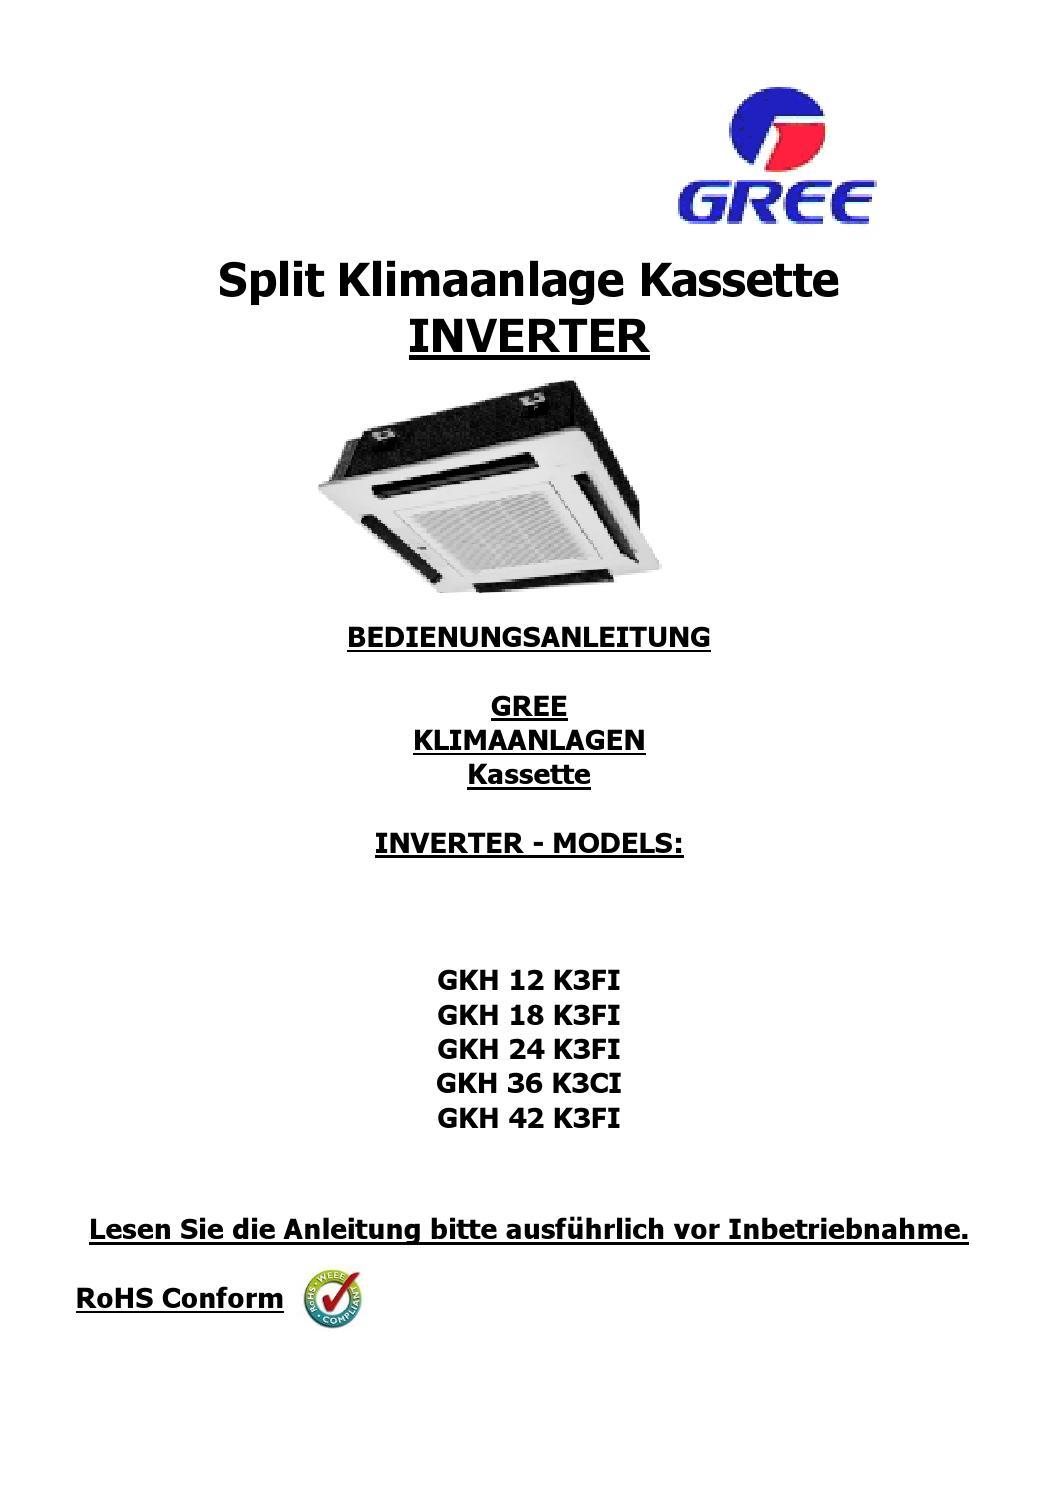 C16 c21 c22 b23 c24 instruction manual kassette inverter deutsch ...